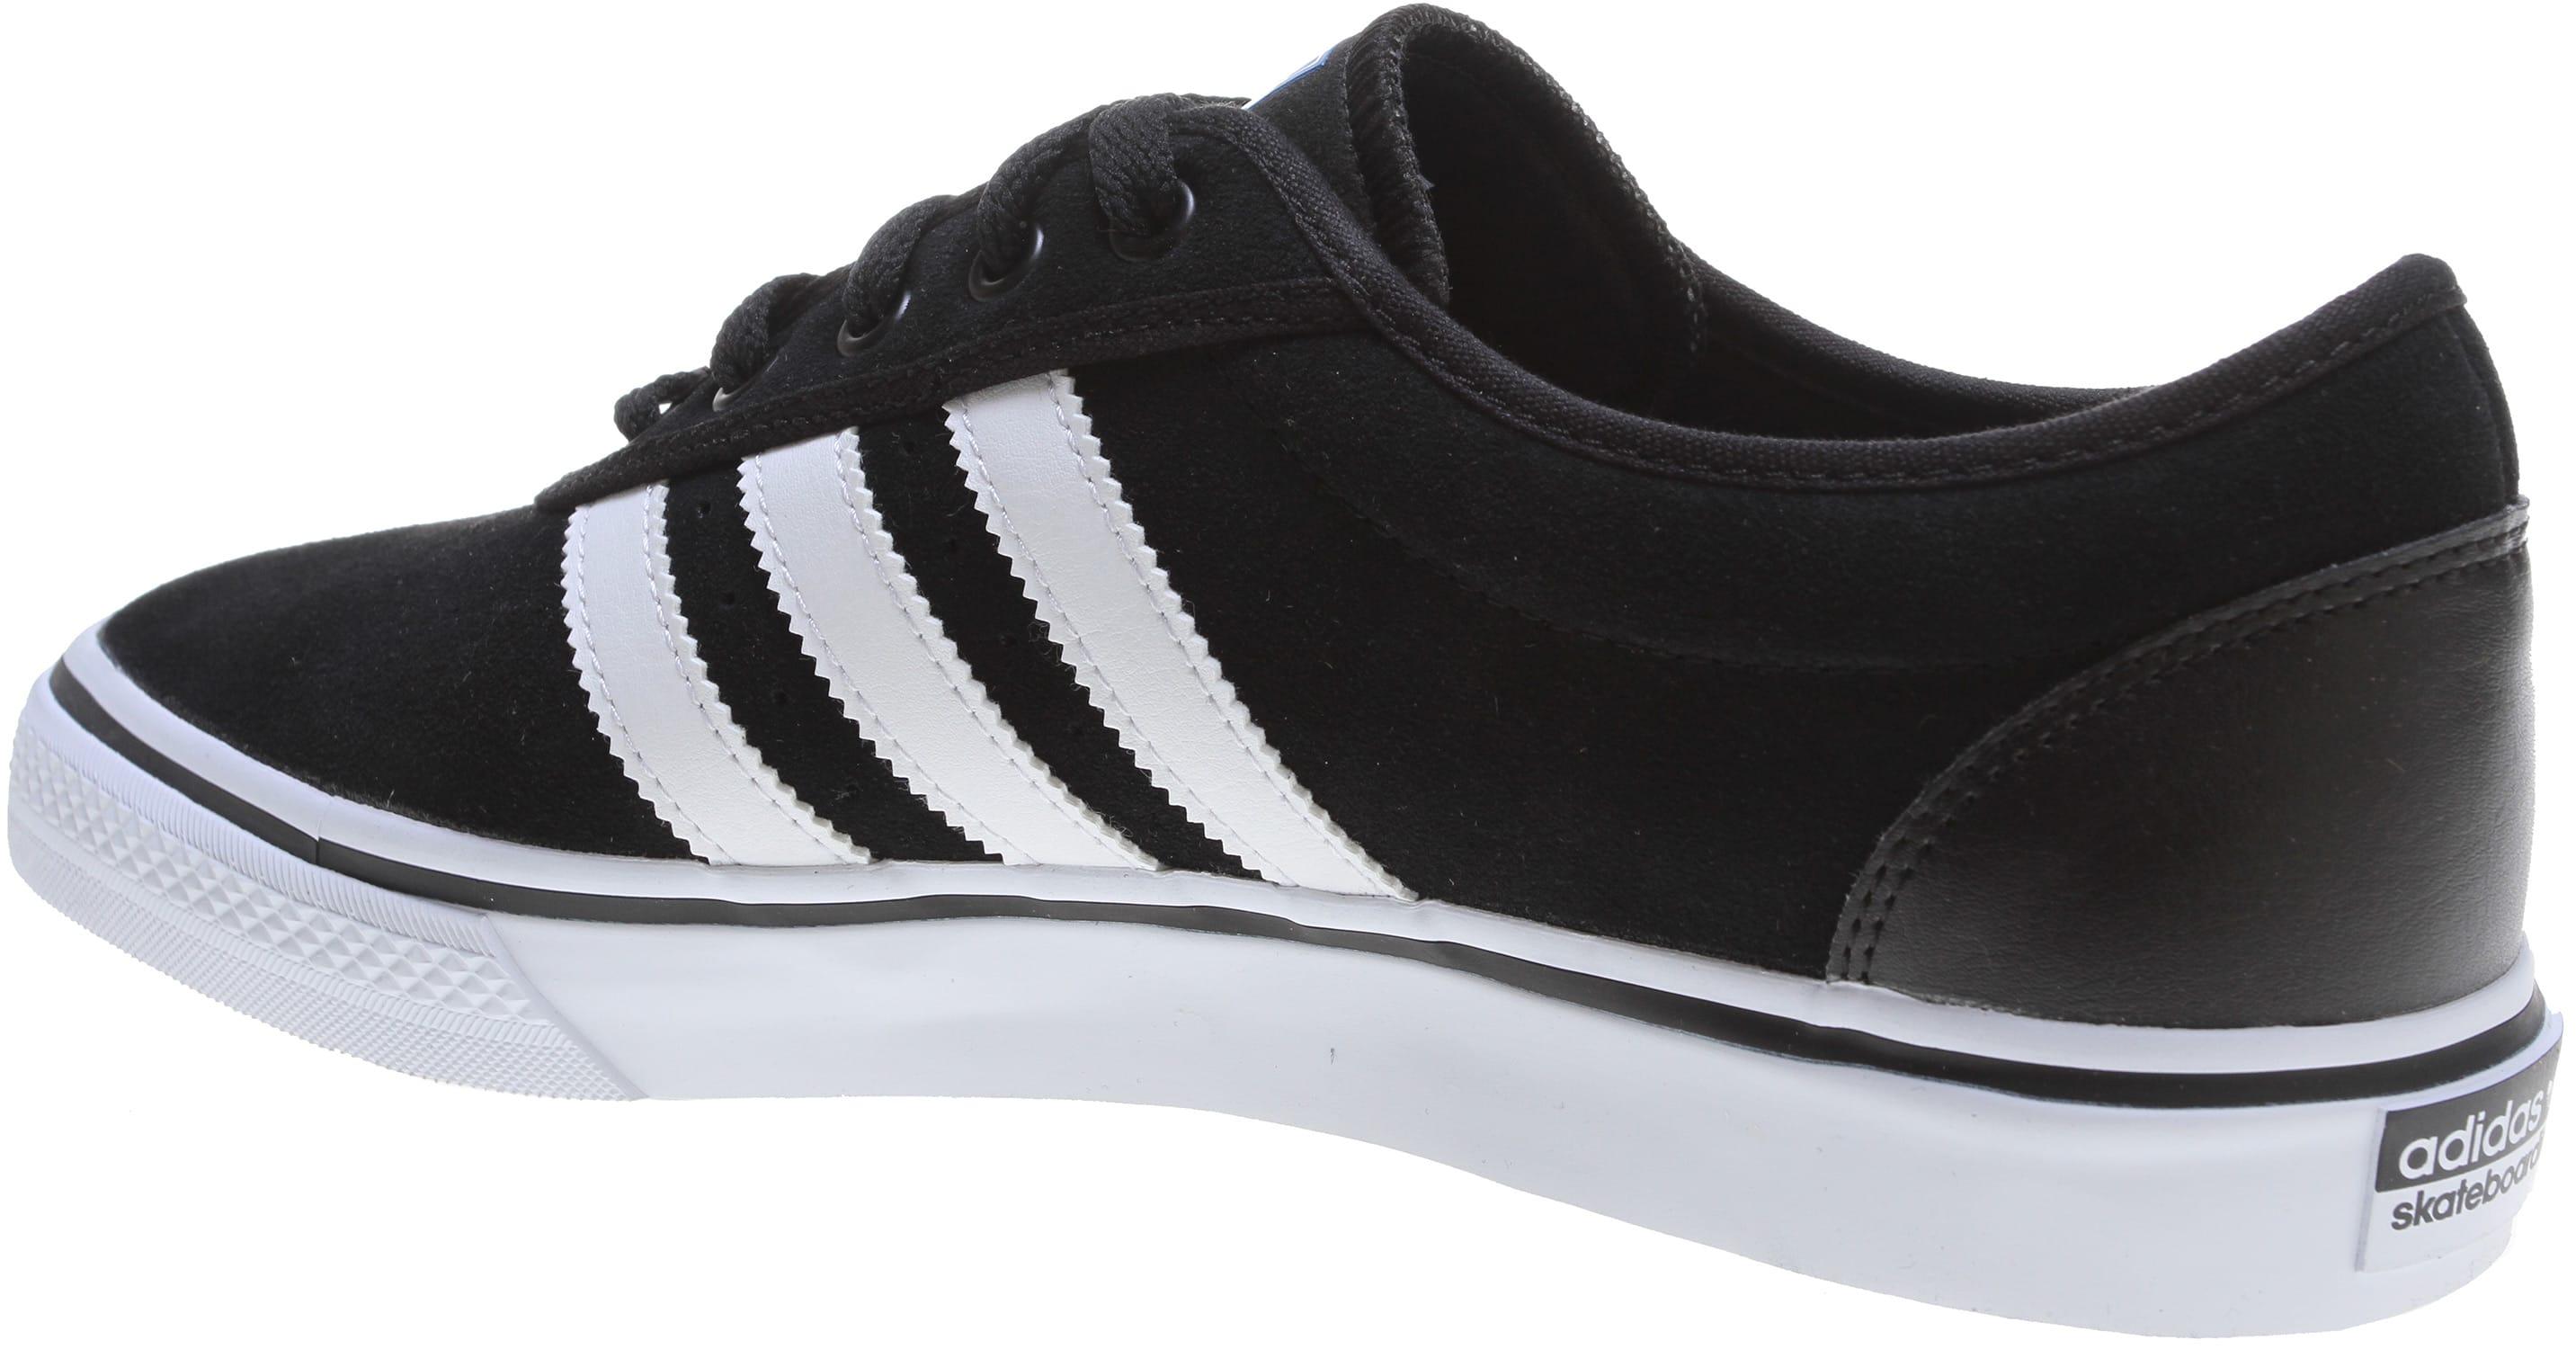 Pro Skate Shoes Adi Adidas Ease tqRcE